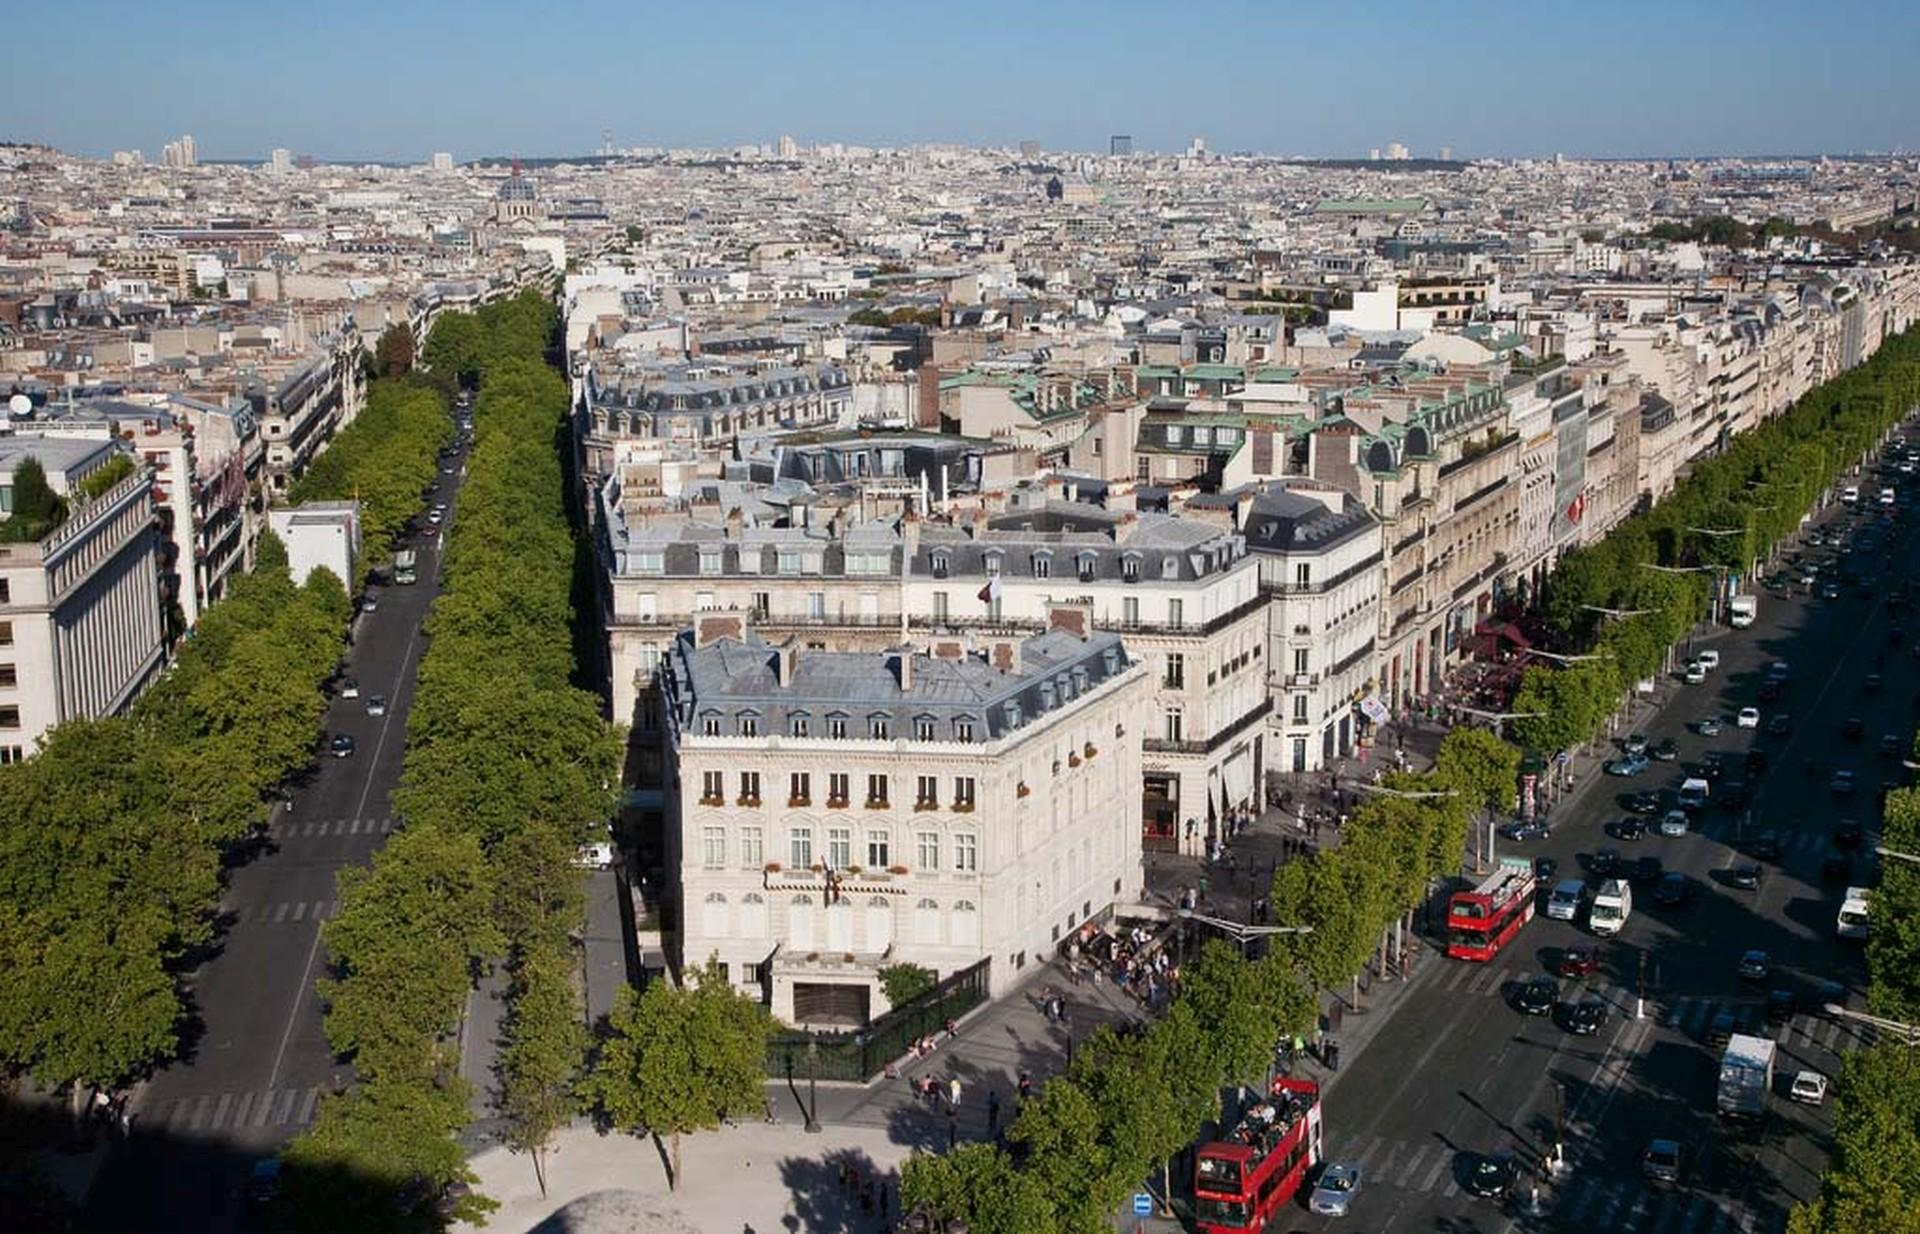 Parigi on top, cercando i panorami più belli